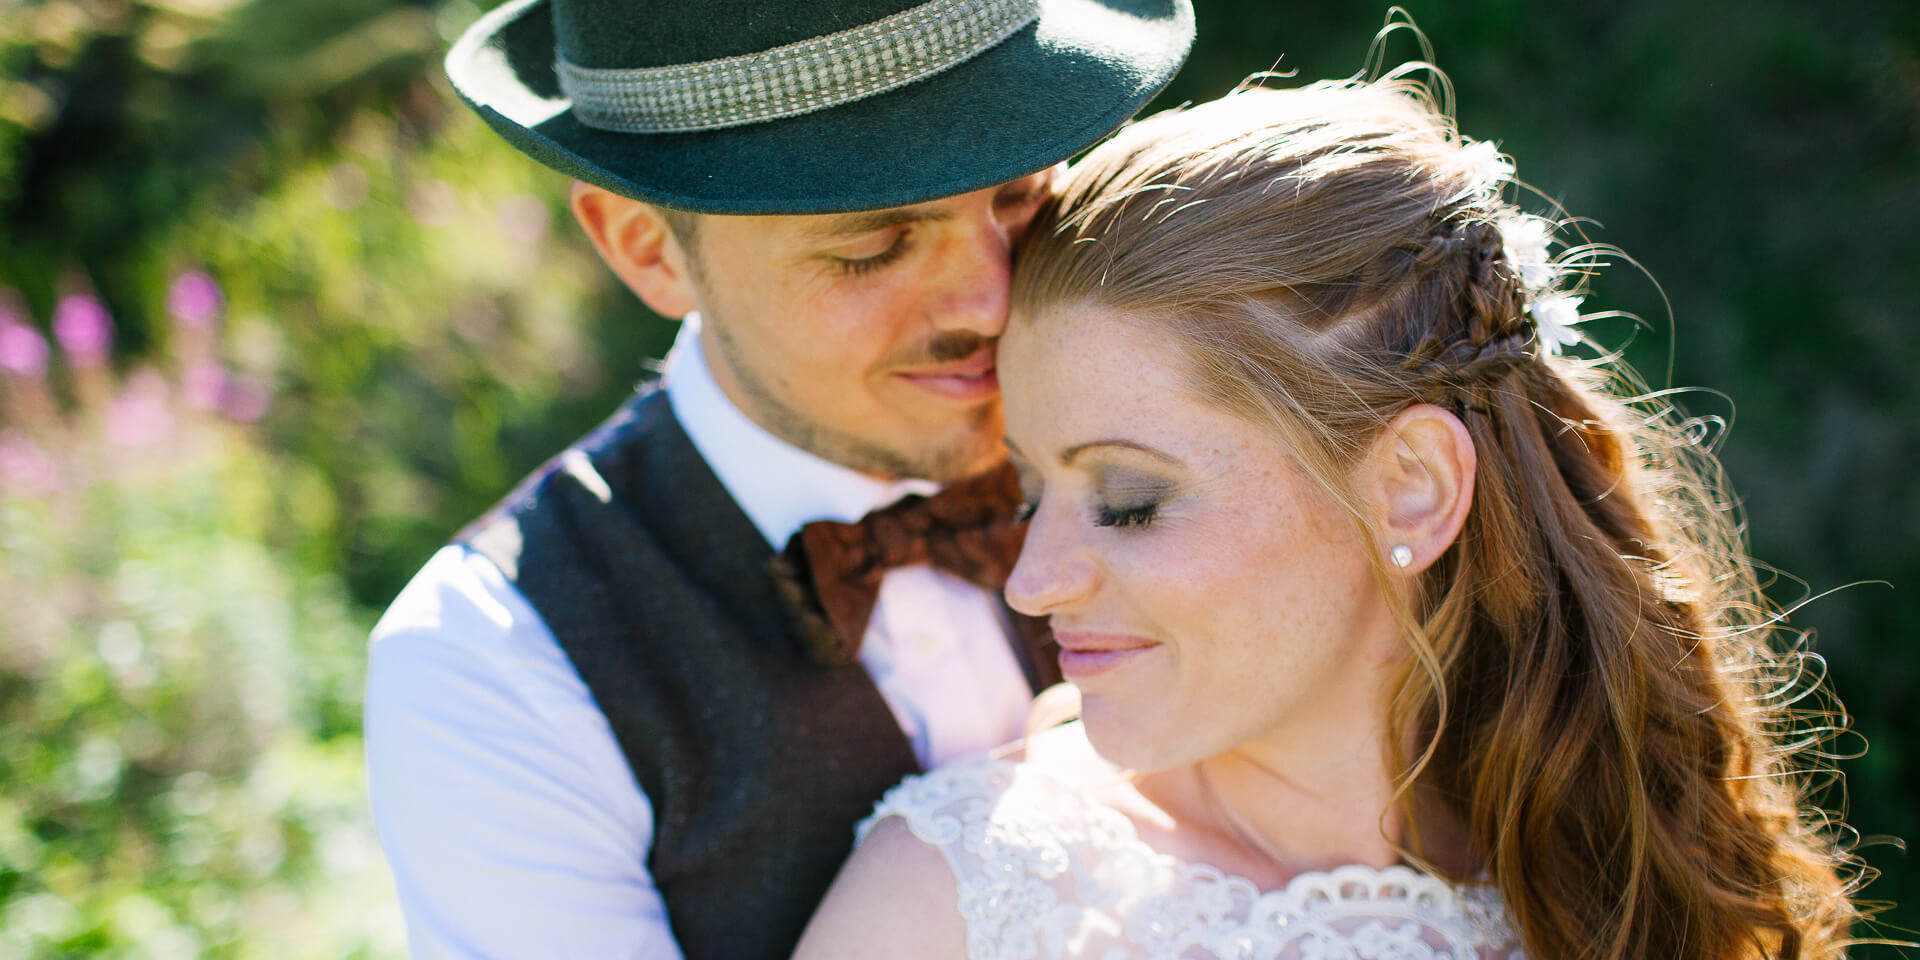 Wedding Photo Landing Page Image for Hampus Oberg Photography